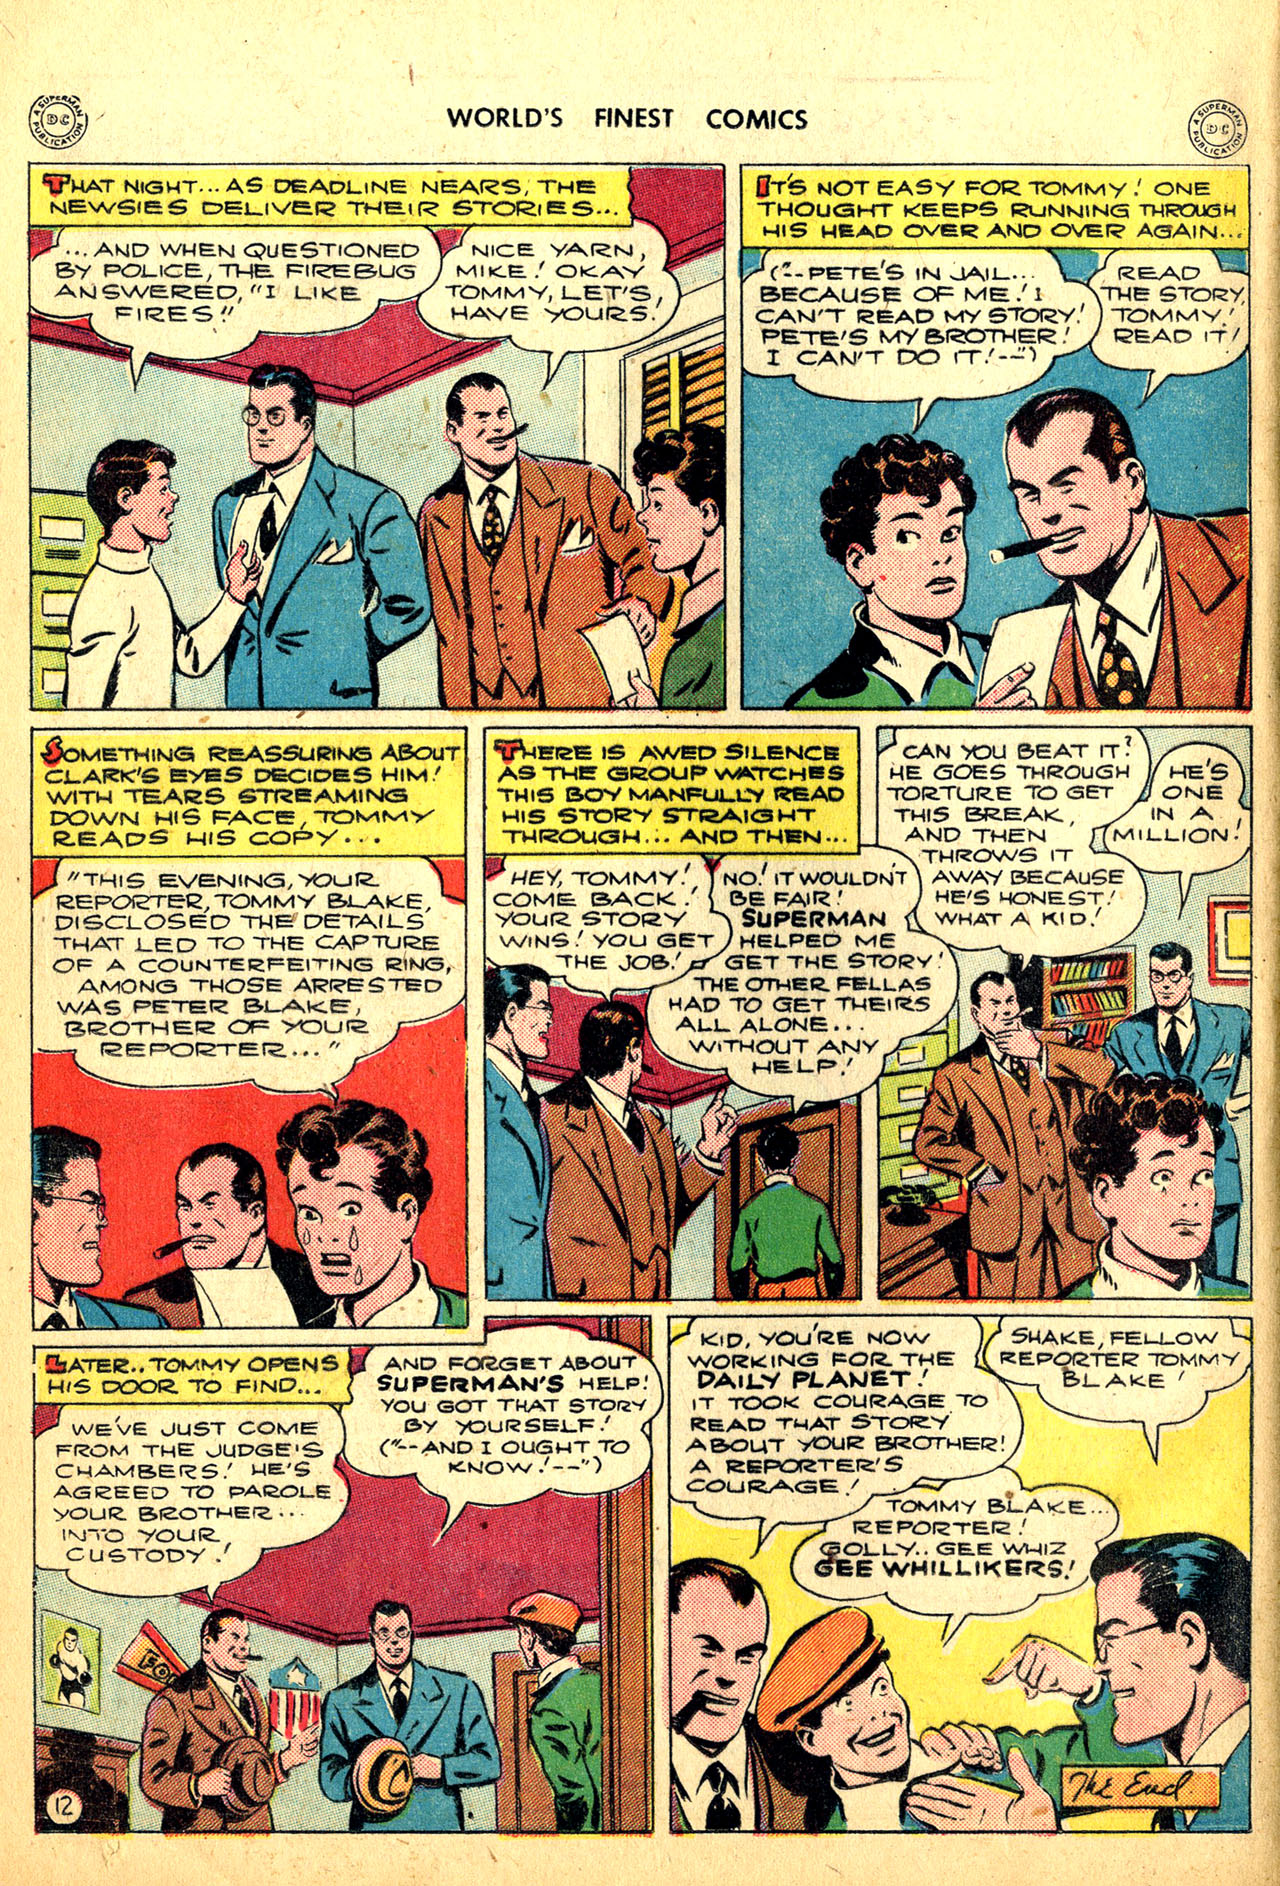 Read online World's Finest Comics comic -  Issue #18 - 14